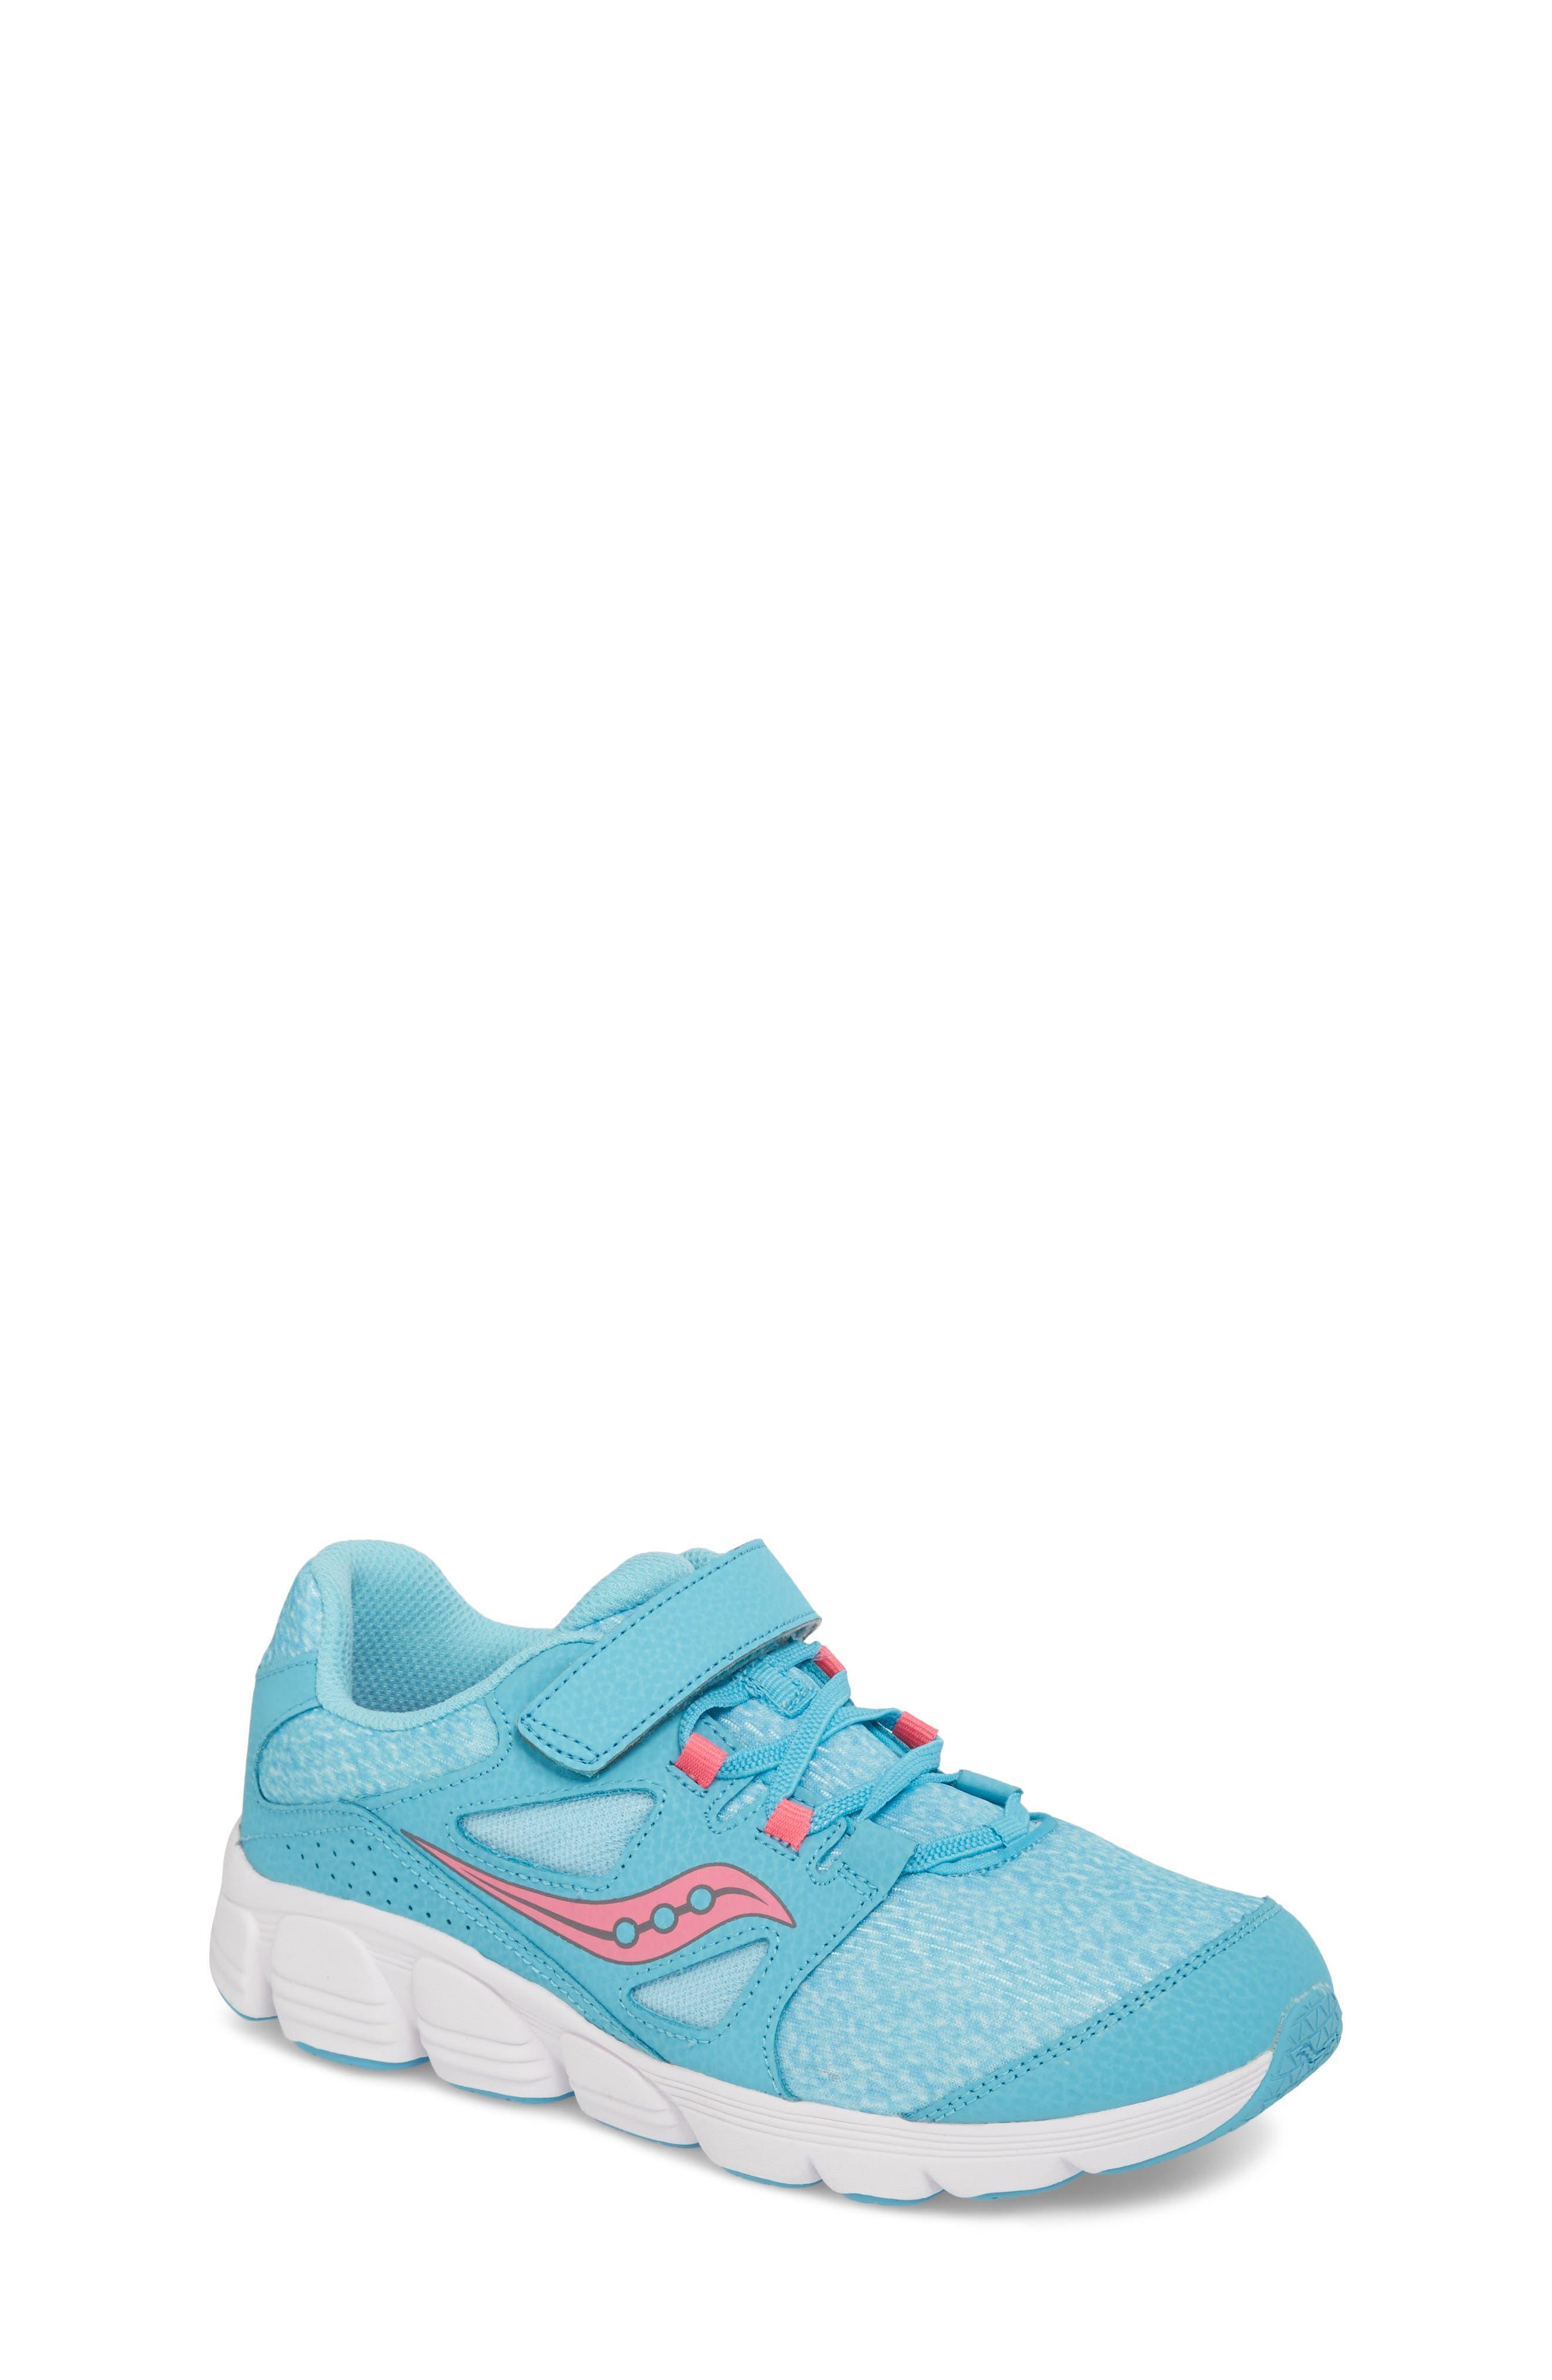 Kotaro 4 Sneaker,                             Main thumbnail 1, color,                             TURQUOISE/ PINK